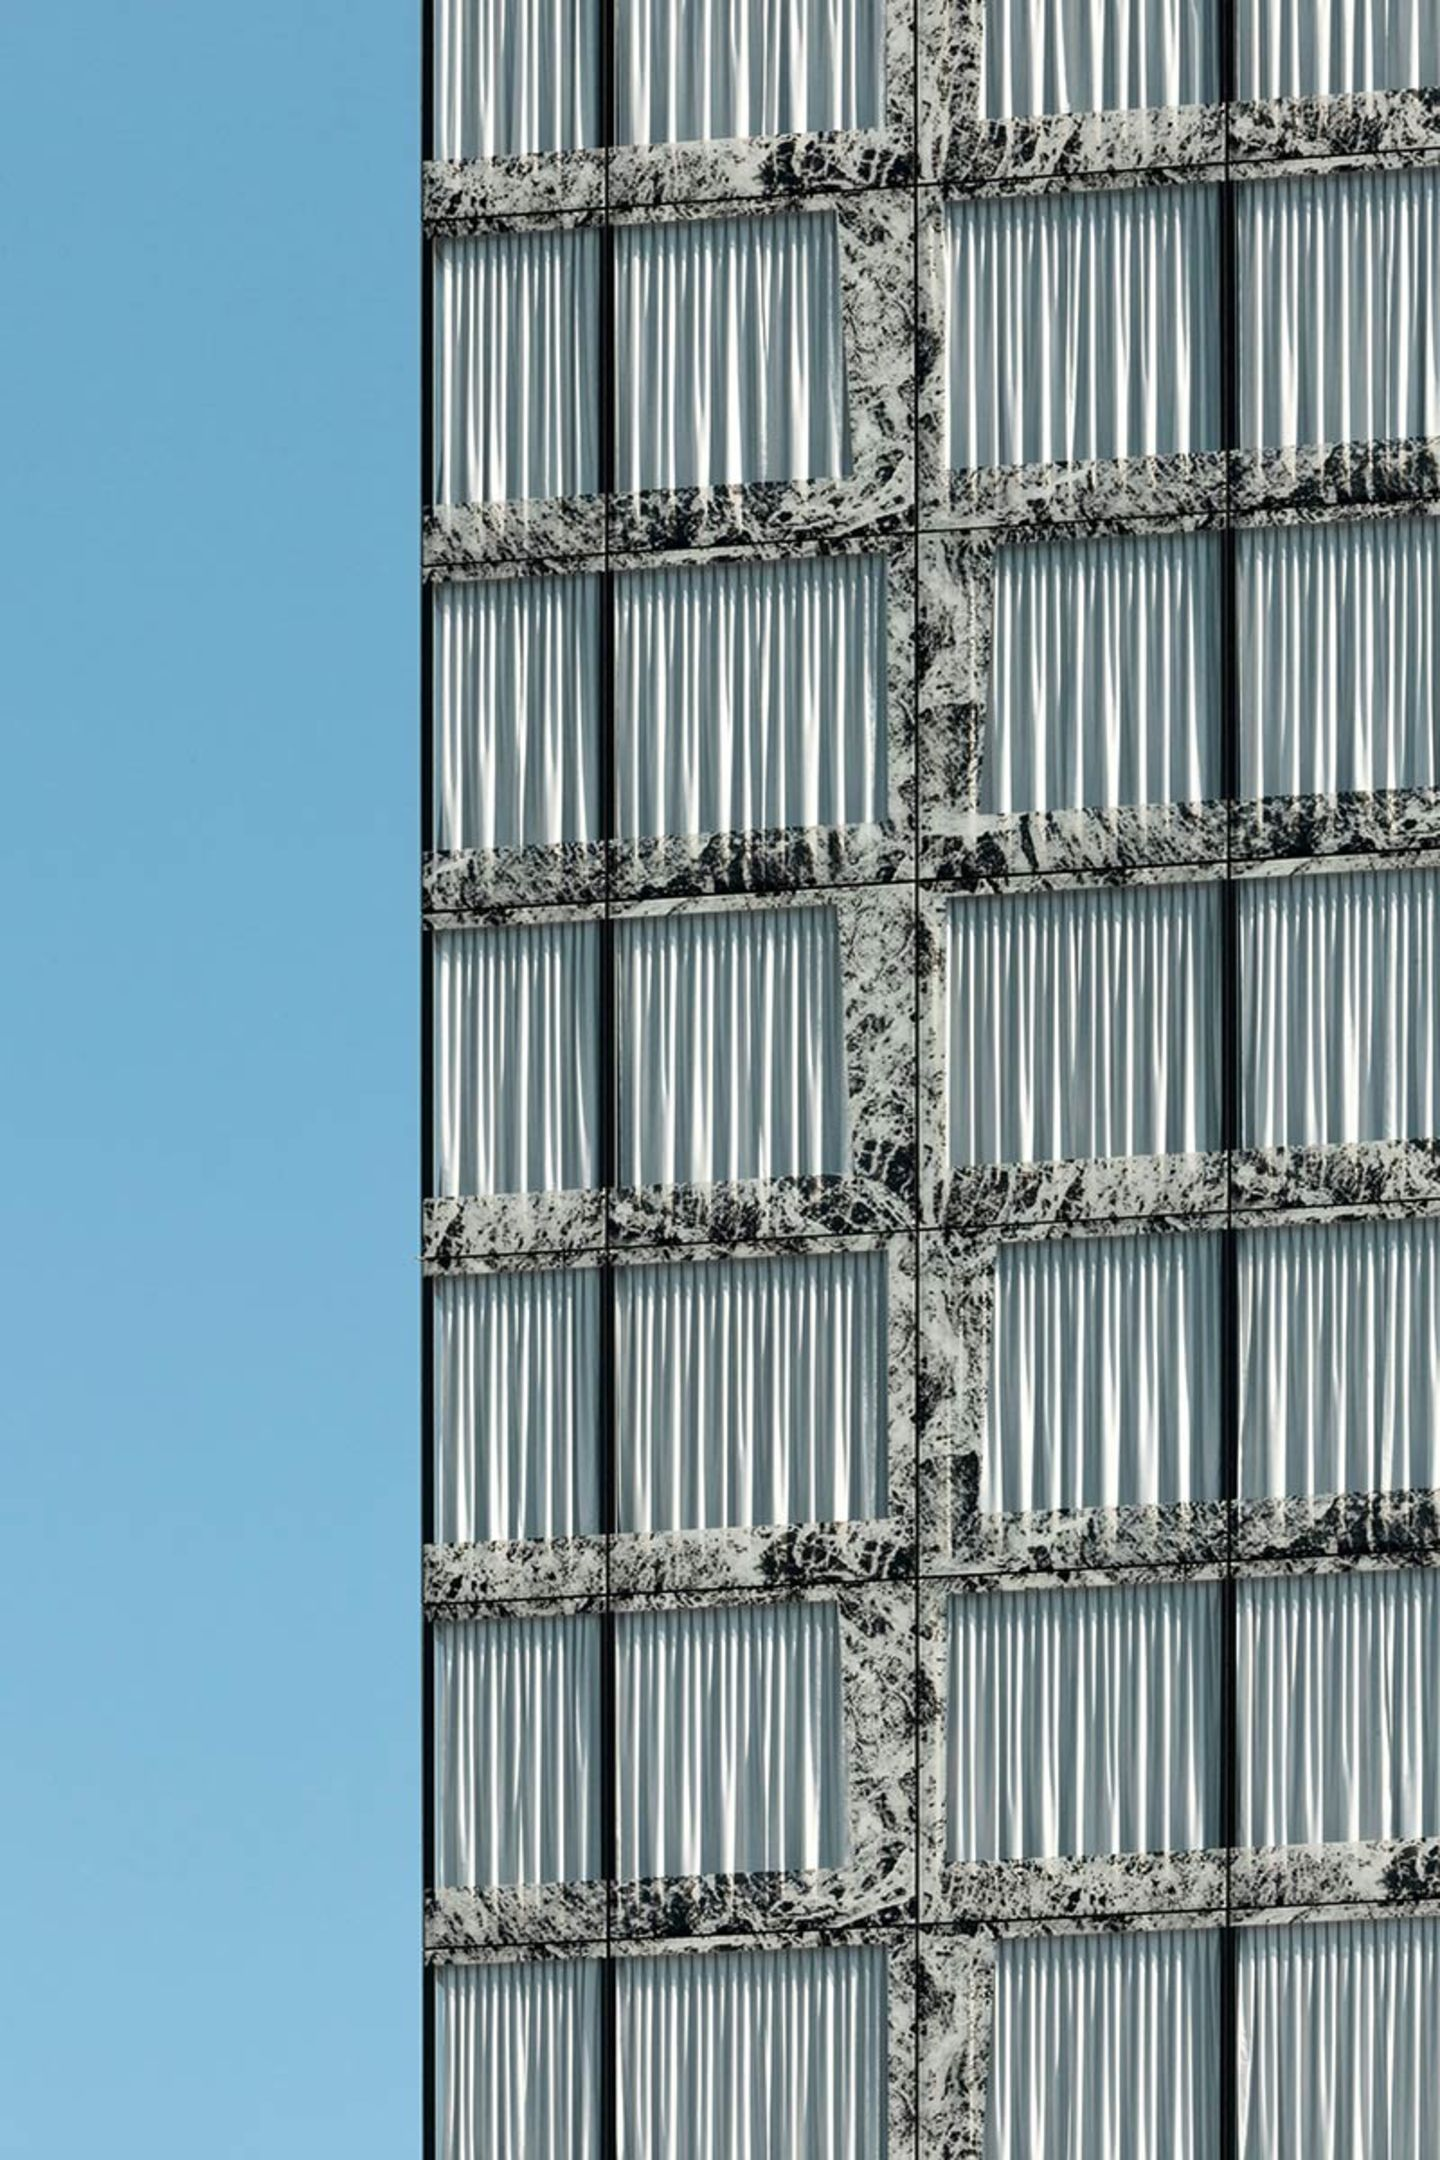 Wiel Arets Architects, Jan Bitter · Allianz Headquarters · Divisare